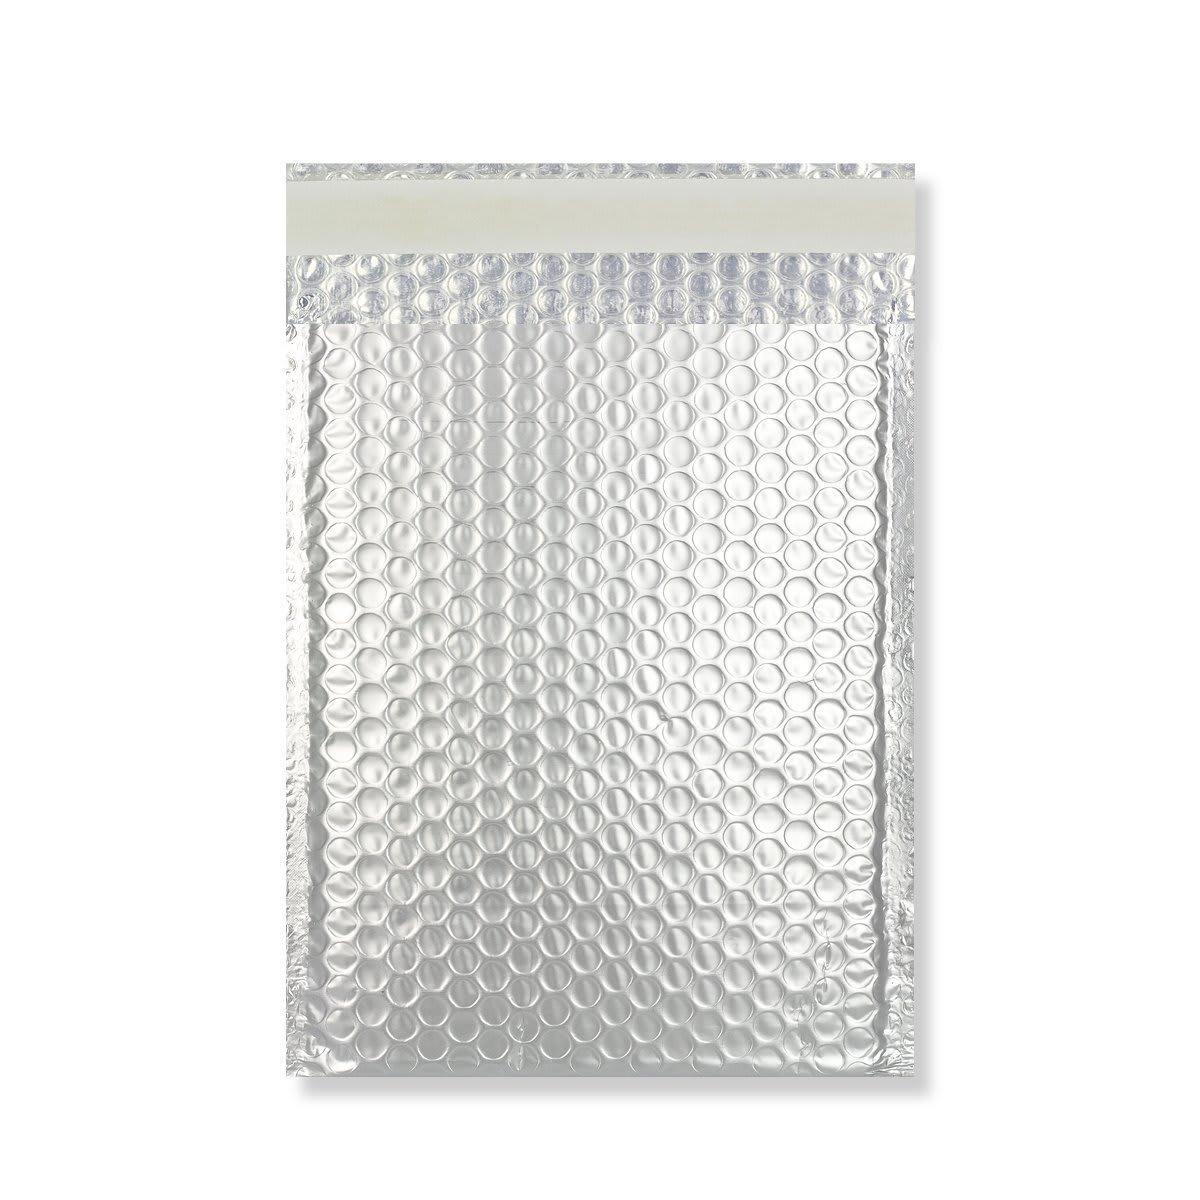 C4 MATT METALLIC SILVER PADDED ENVELOPES (324 x 230MM)